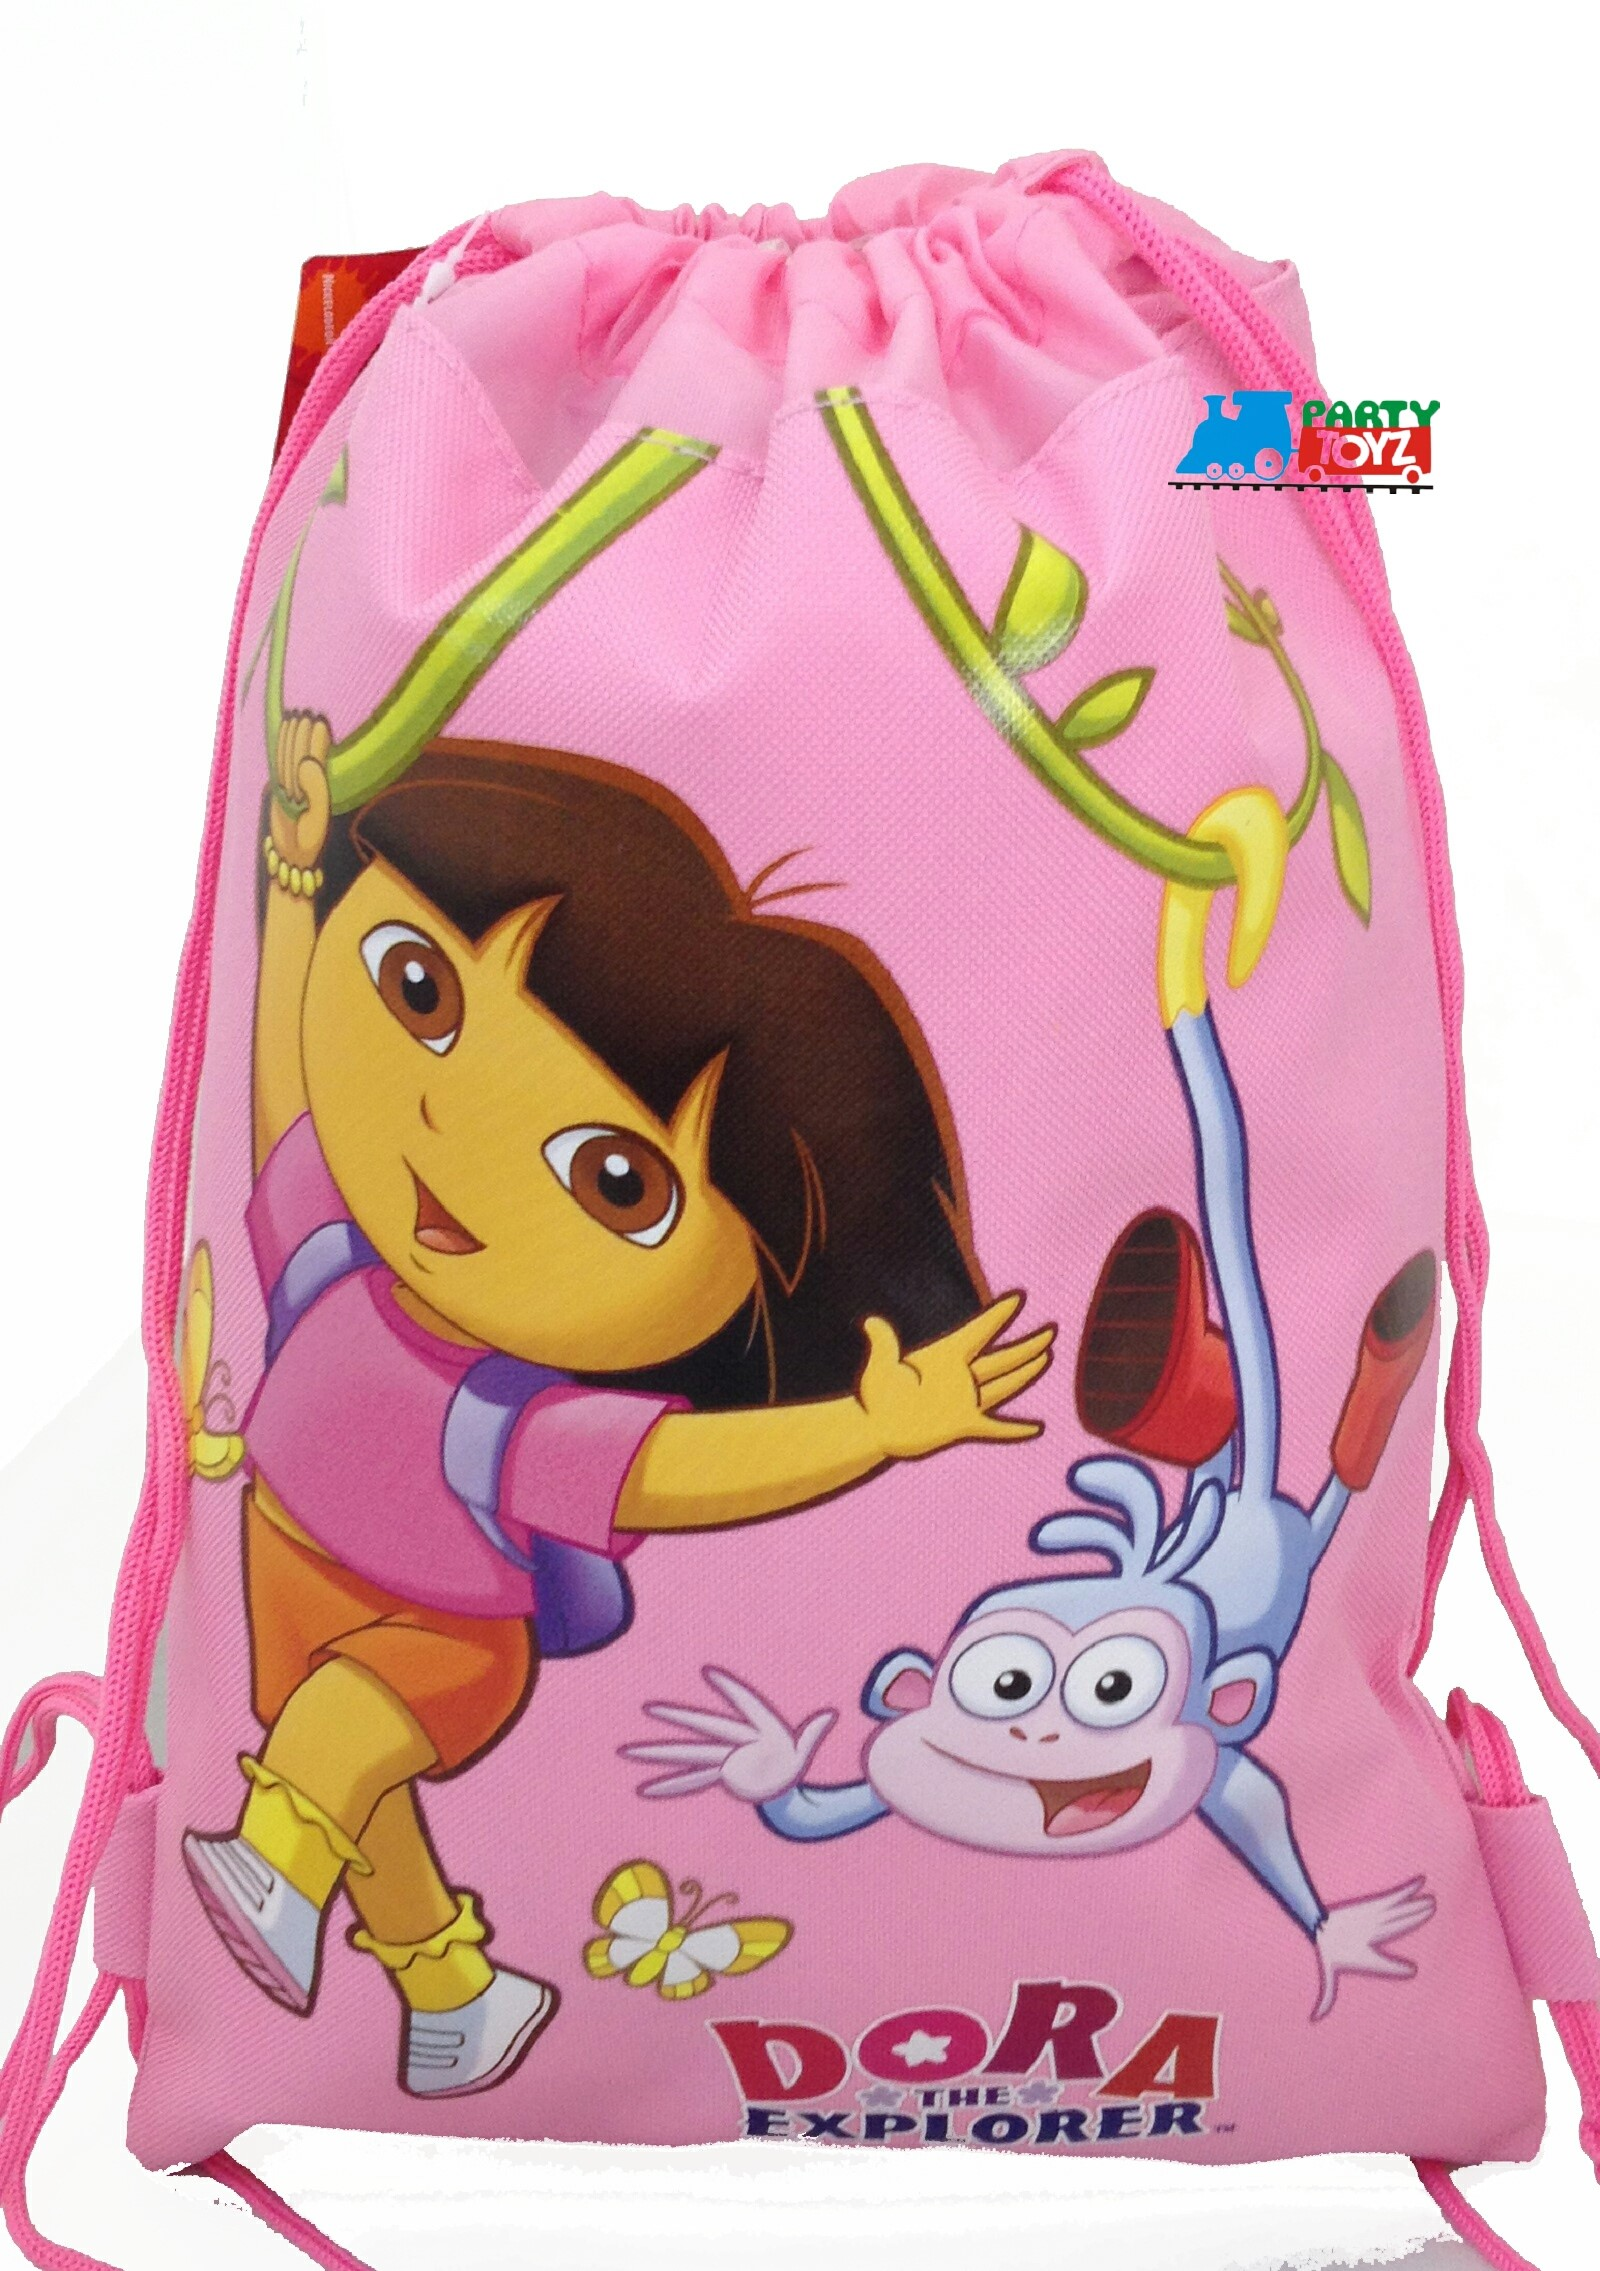 Drawstring Bag Dora the Explorer Pink Cloth String Bag by Bare Brothers